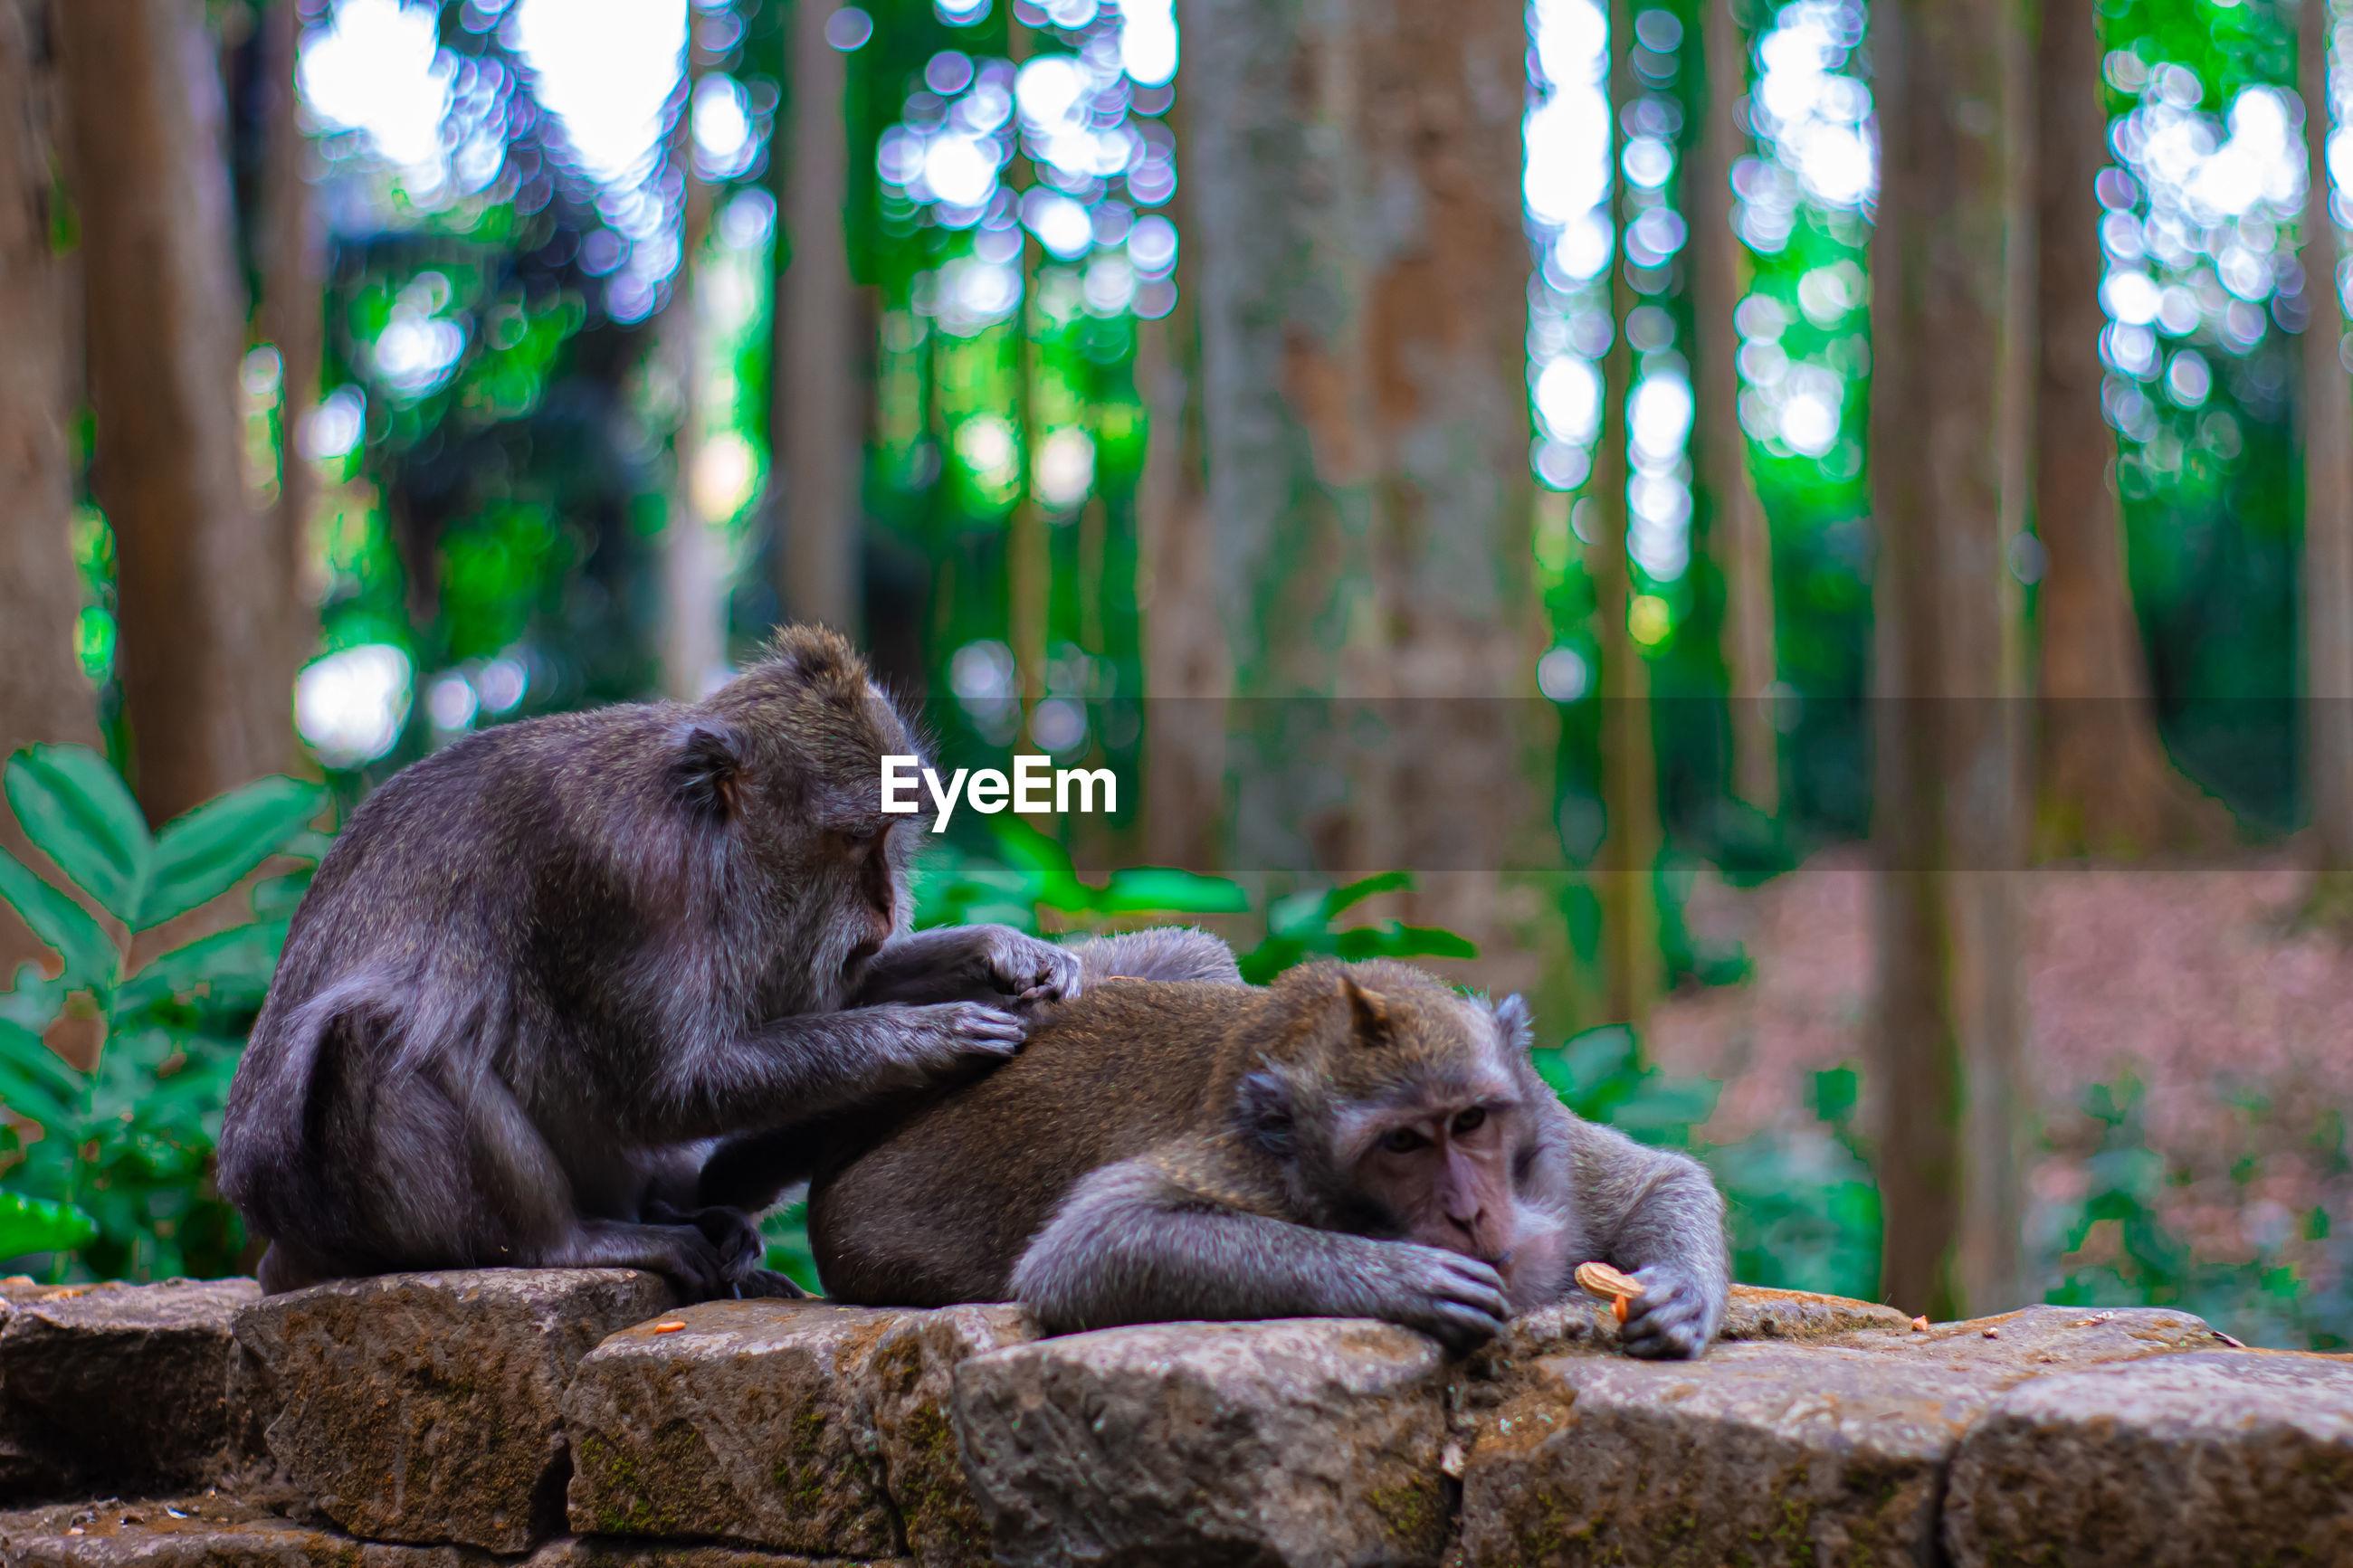 MONKEY SITTING ON ROCK IN FOREST